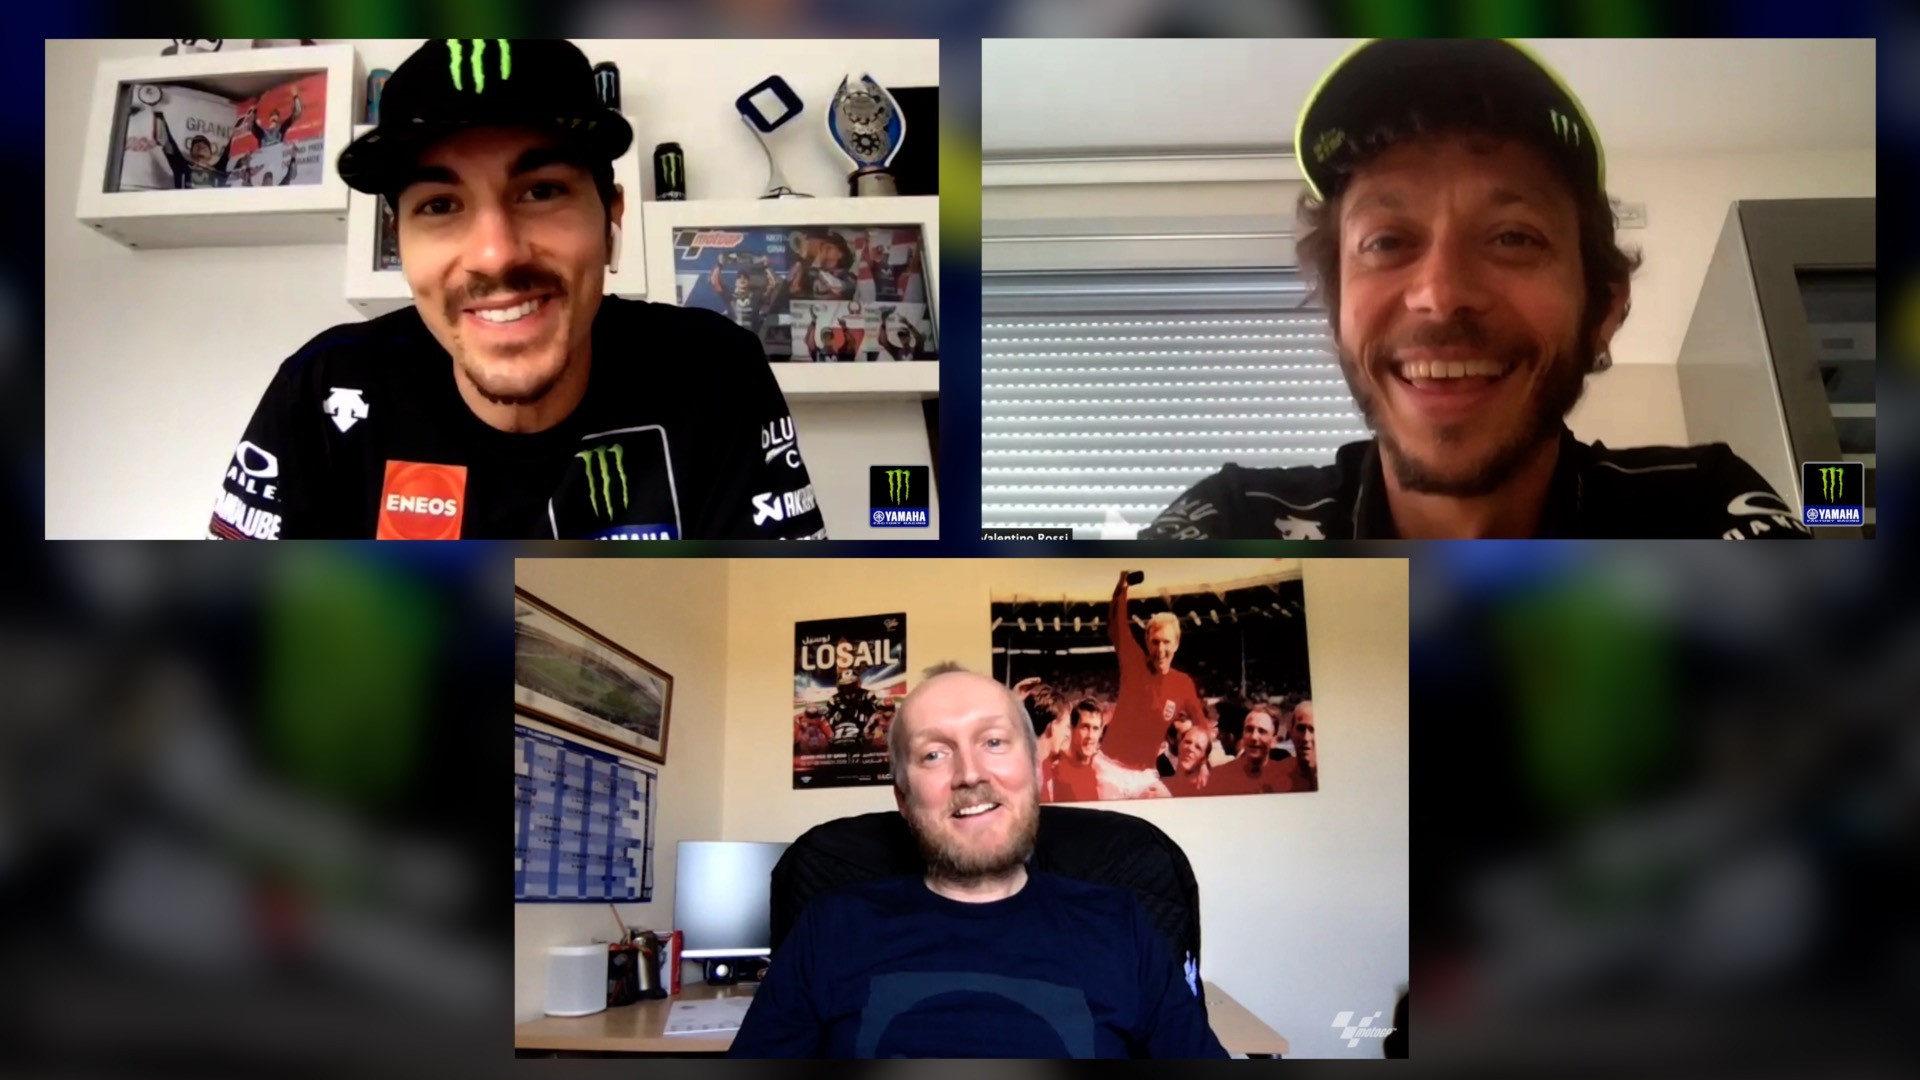 (Clockwise from top left) Maverick Vinales, Valentino Rossi, and journalist and MotoGP commentator Matt Birt. Photo courtesy of Monster Energy Yamaha.